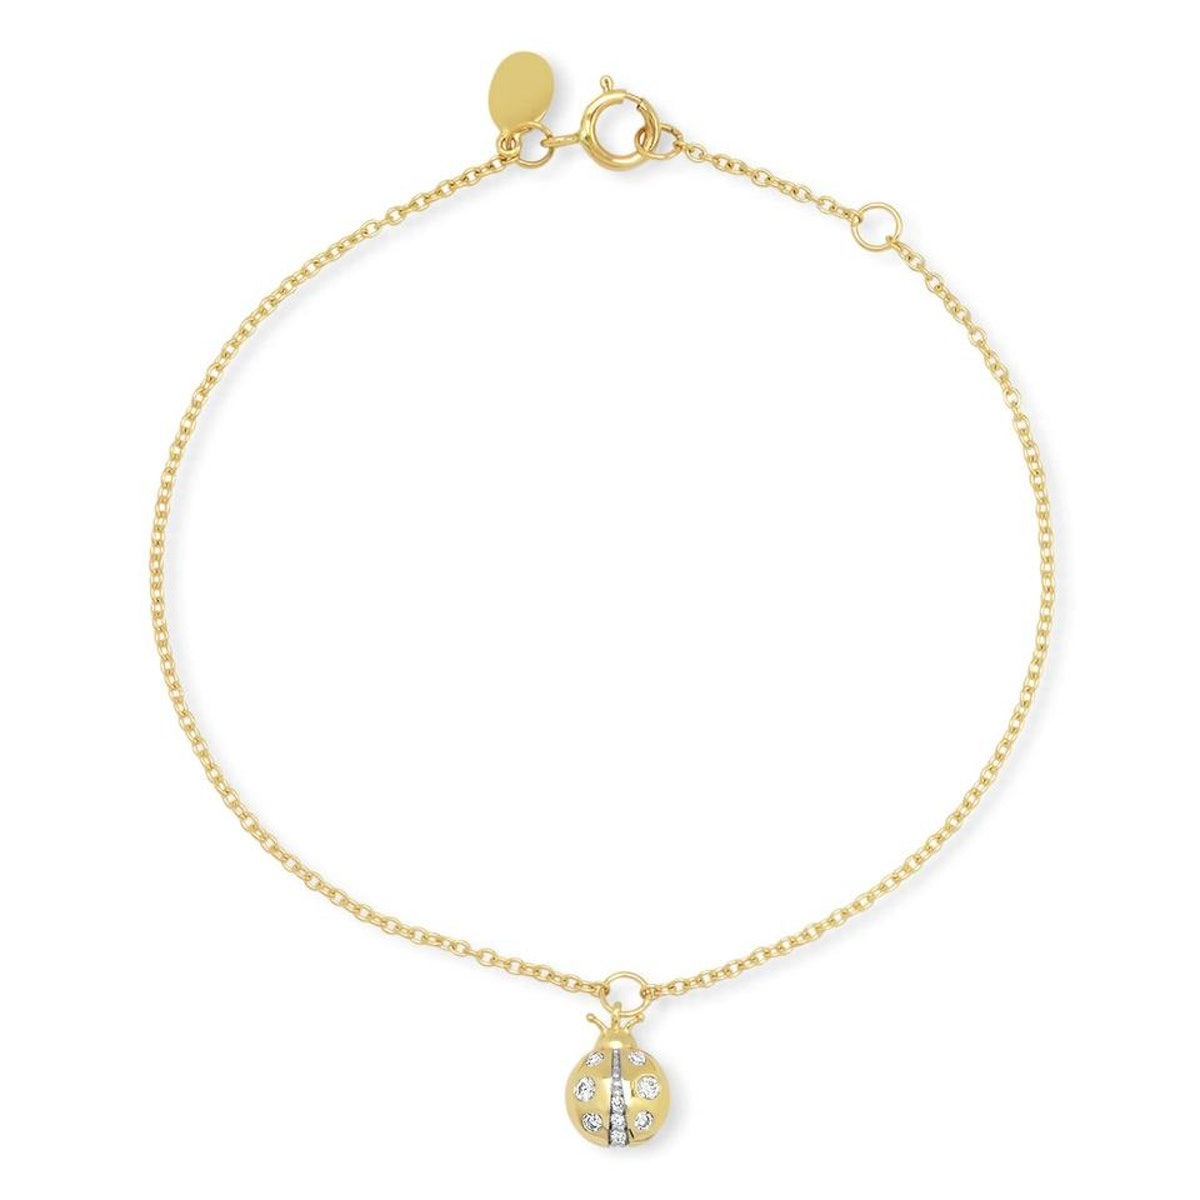 Diamond Ladybug Charm Bracelet